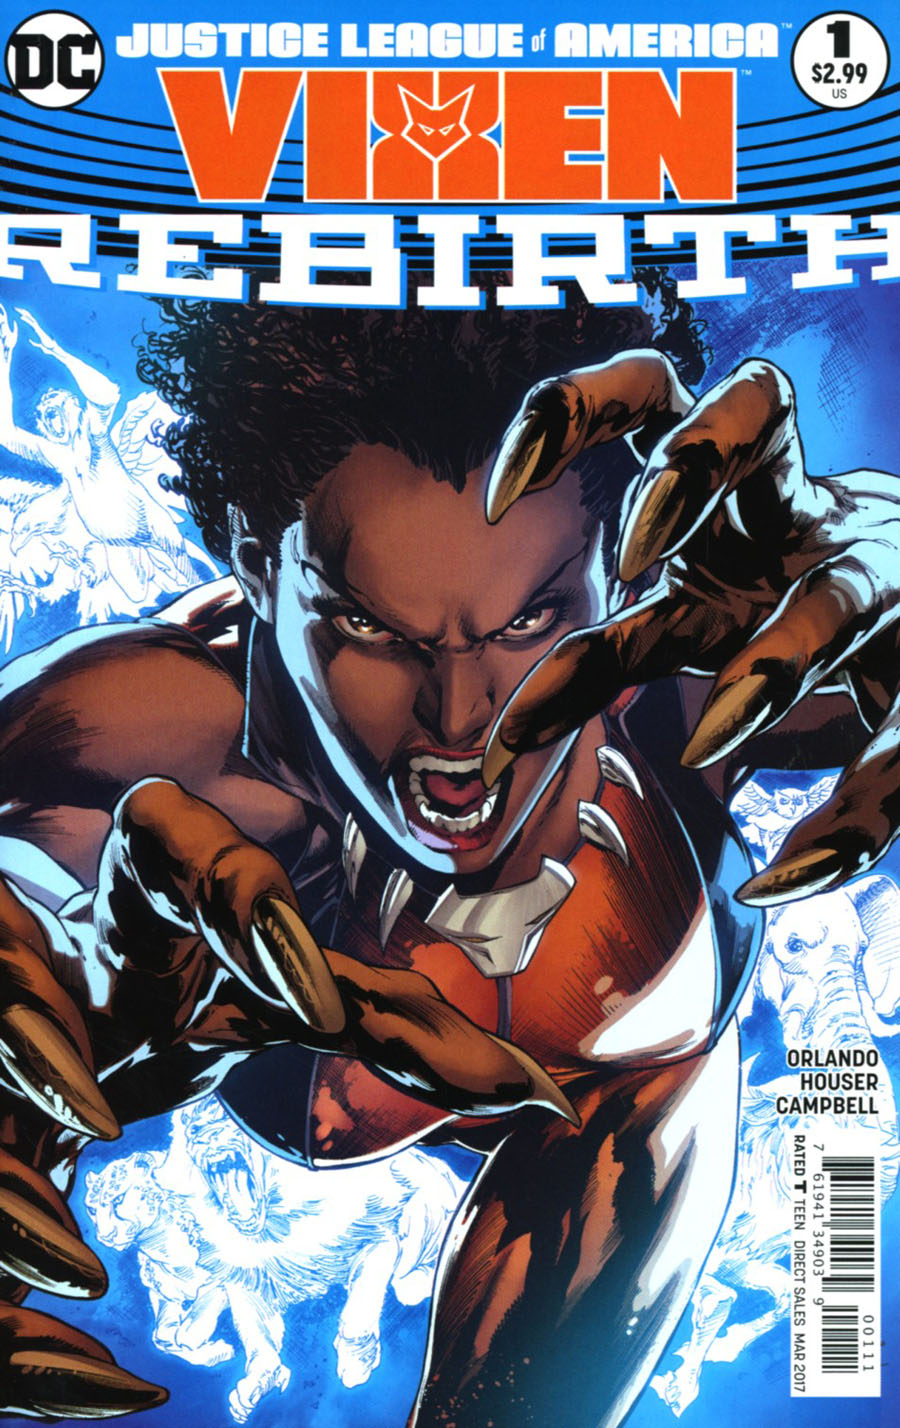 Justice League Of America Vixen Rebirth #1 Cover A Regular Ivan Reis & Joe Prado Cover